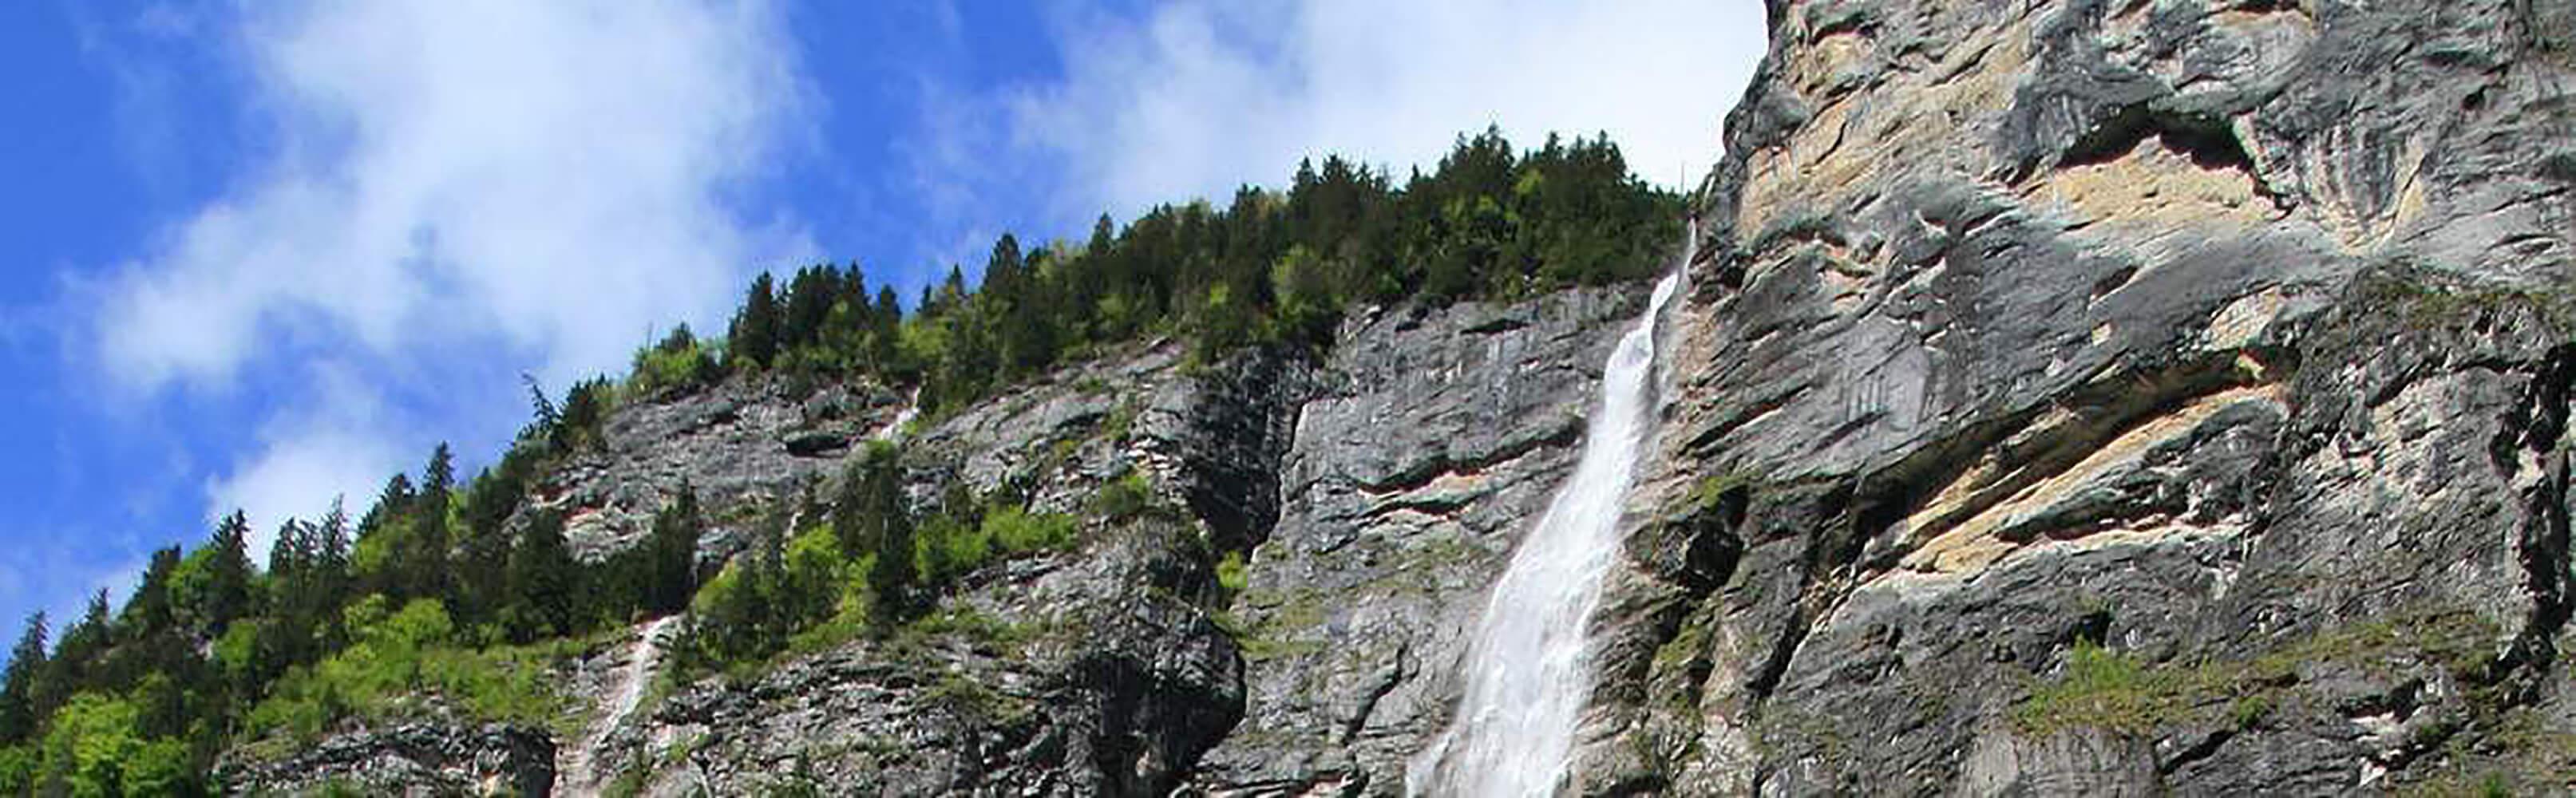 Mürrenbachfall, Lauterbrunnen 1